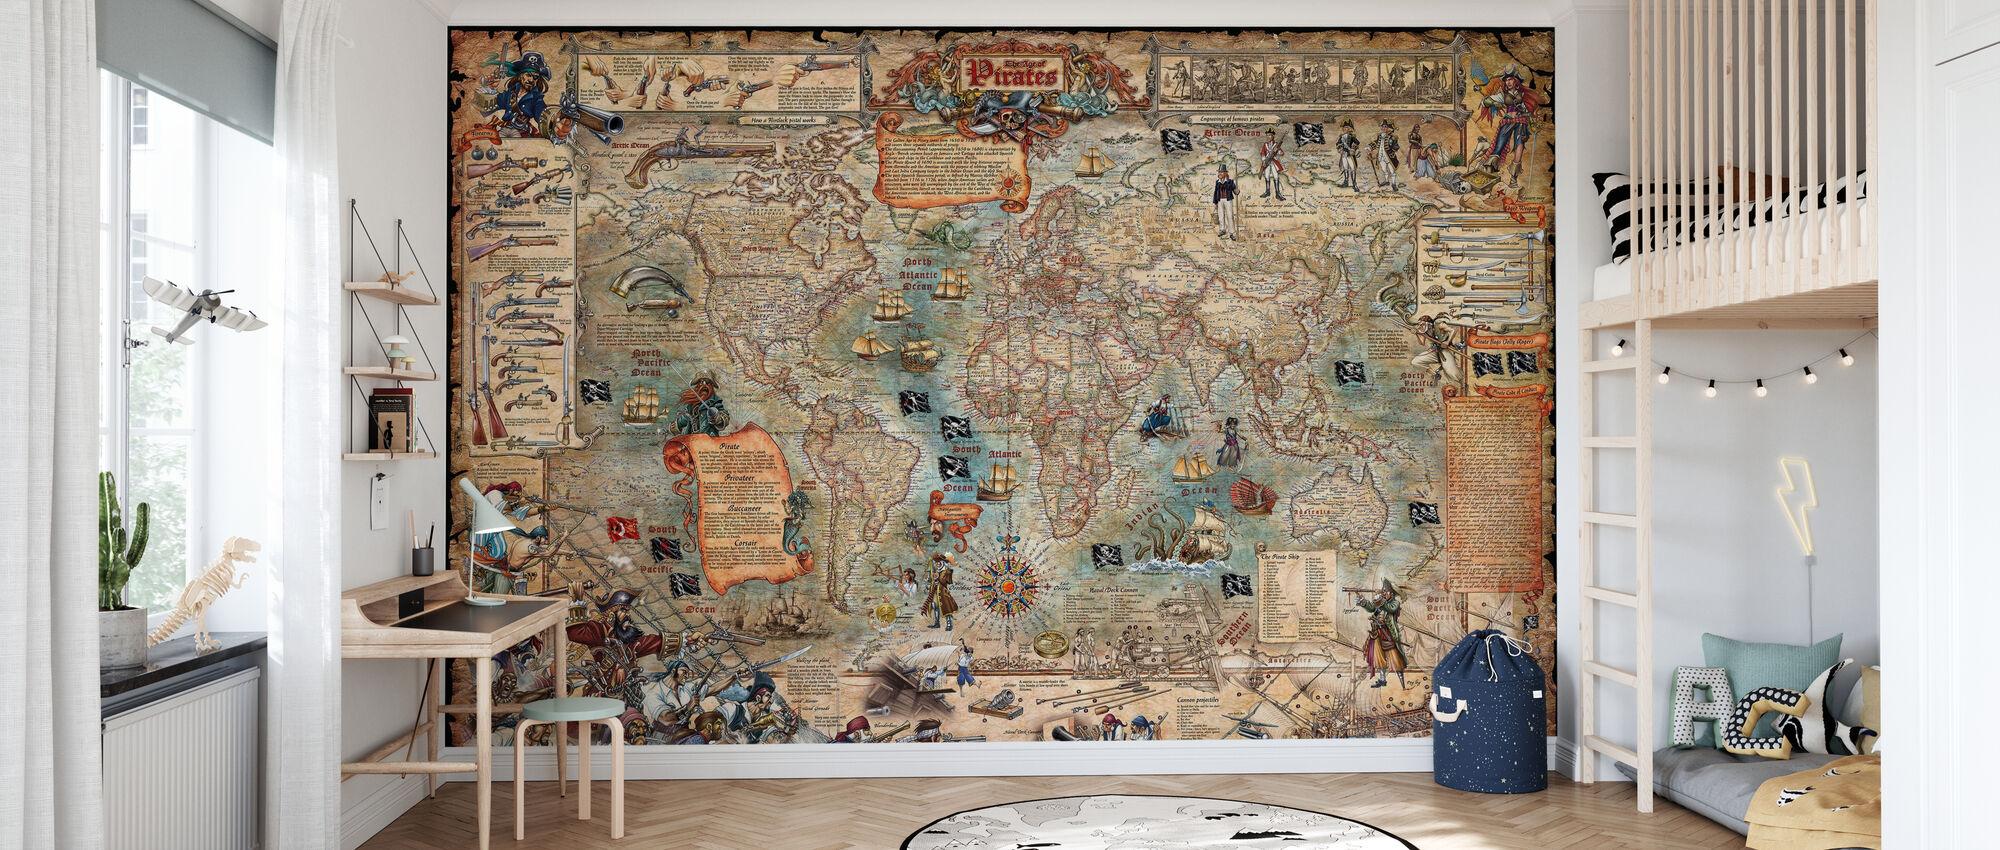 Pirate Map - Wallpaper - Kids Room